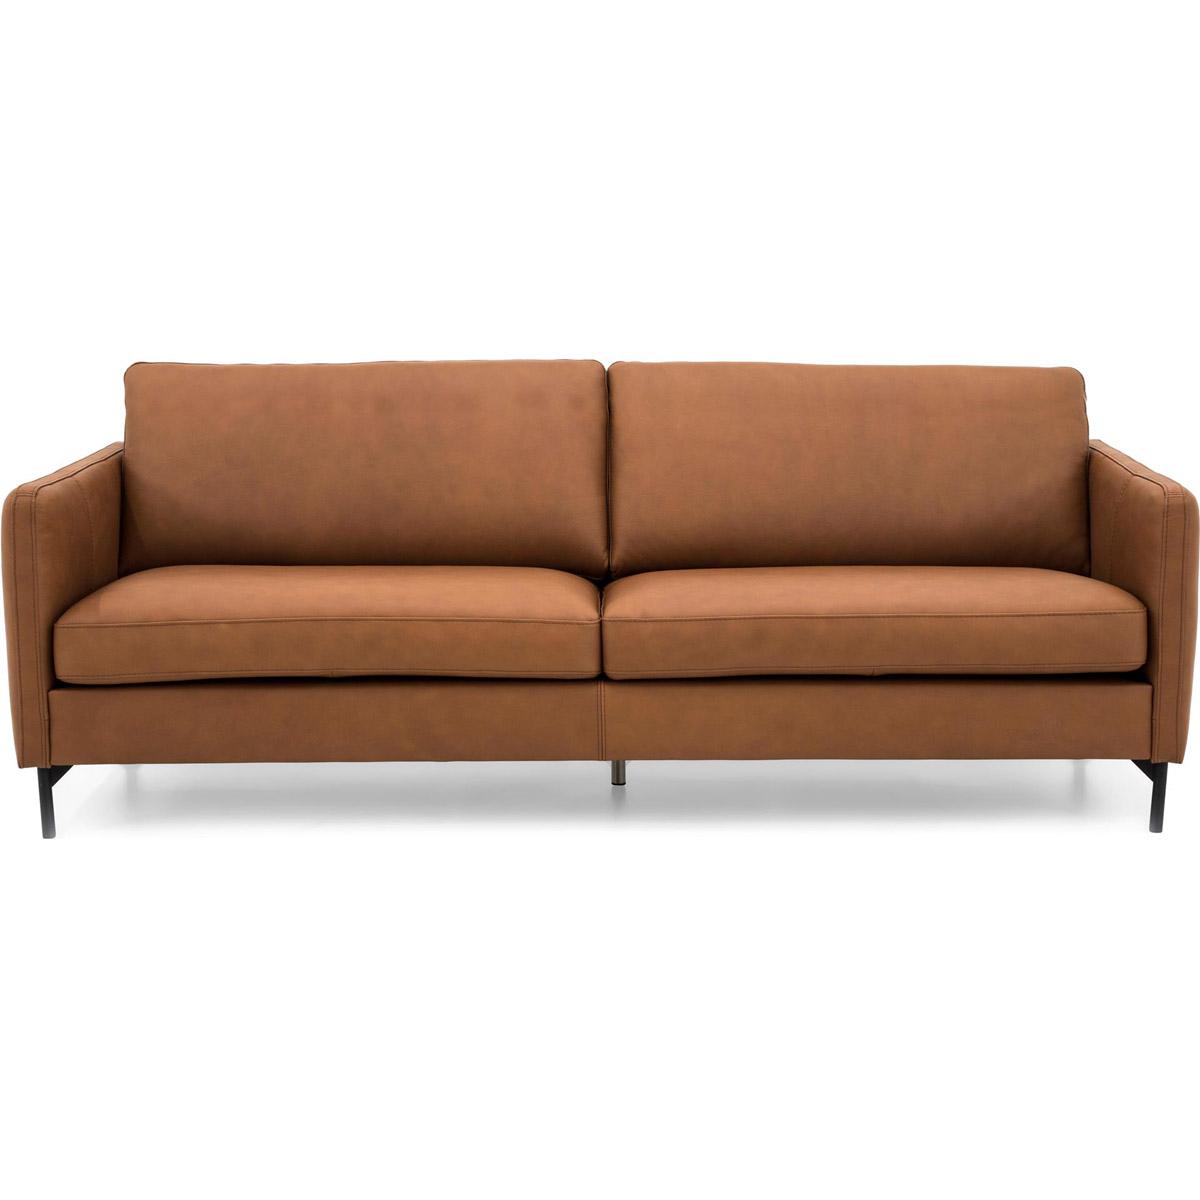 Väddö Plus soffa 3-sits i brunt läder